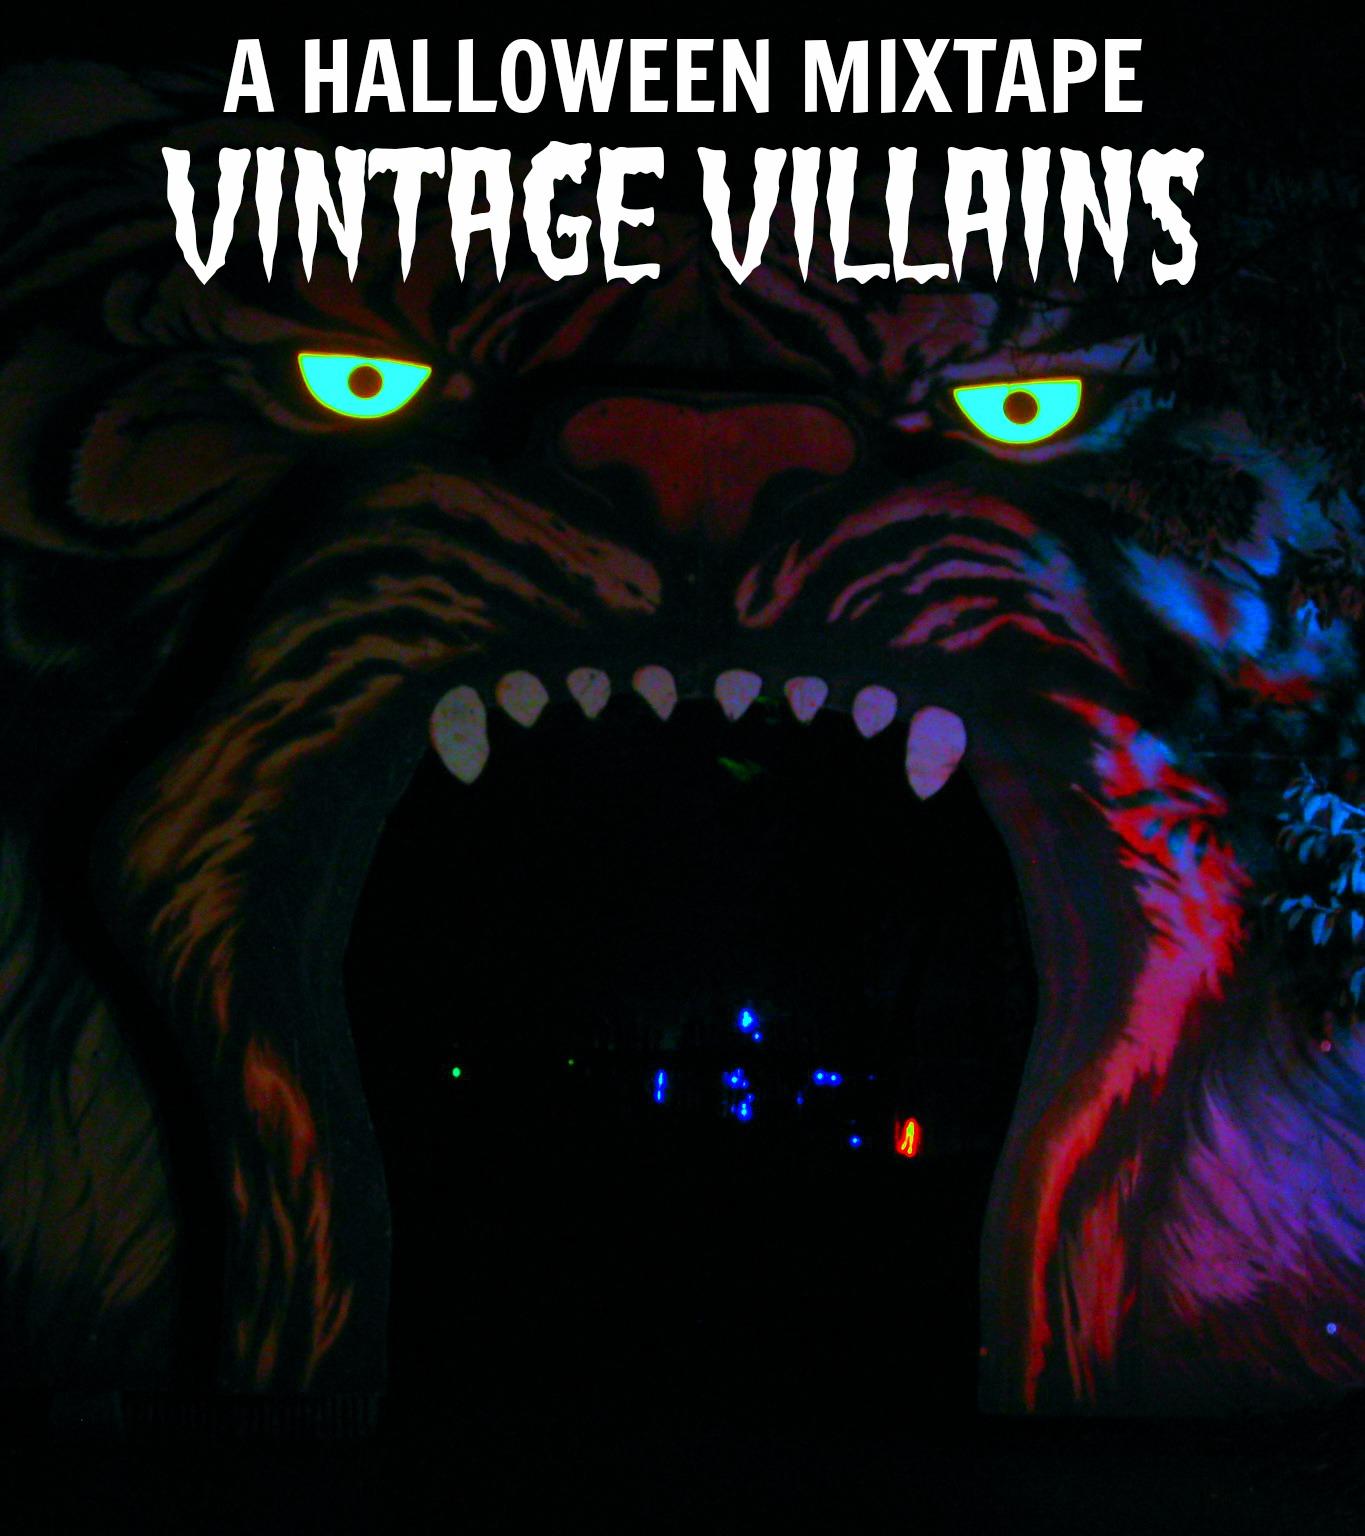 on my honor: halloween mixtape: vintage villains